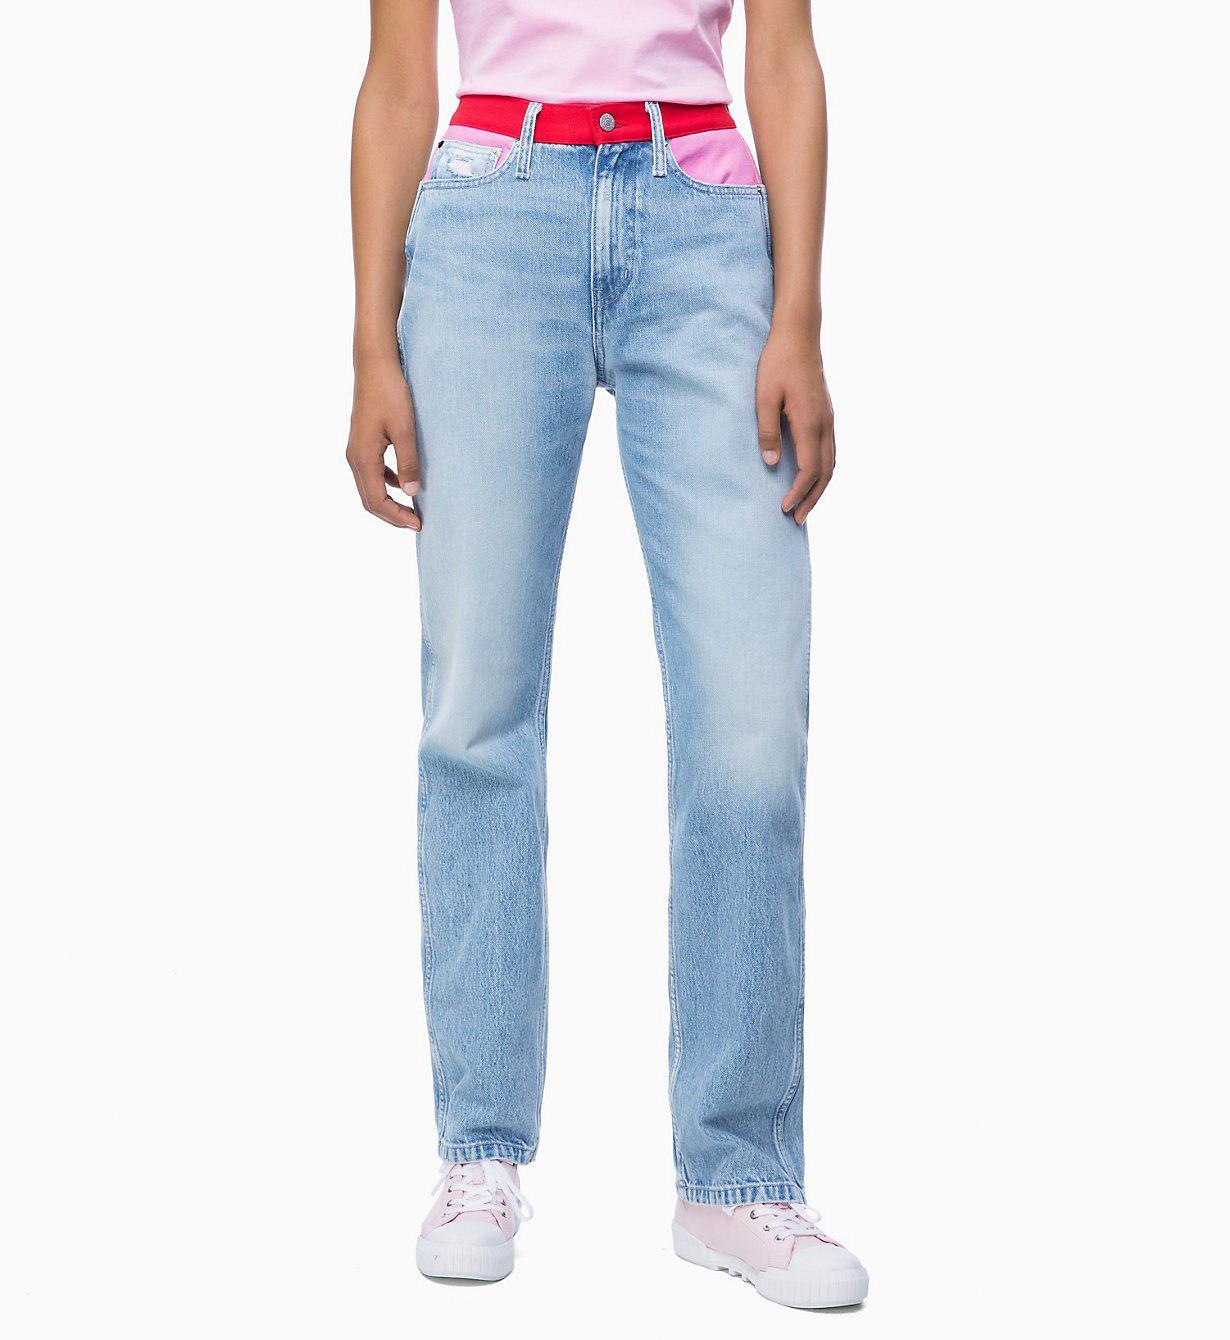 Calvin Klein Ckj 030 High Rise Straight Blocked Jeans in Blue - Lyst 0a6fc64dcd